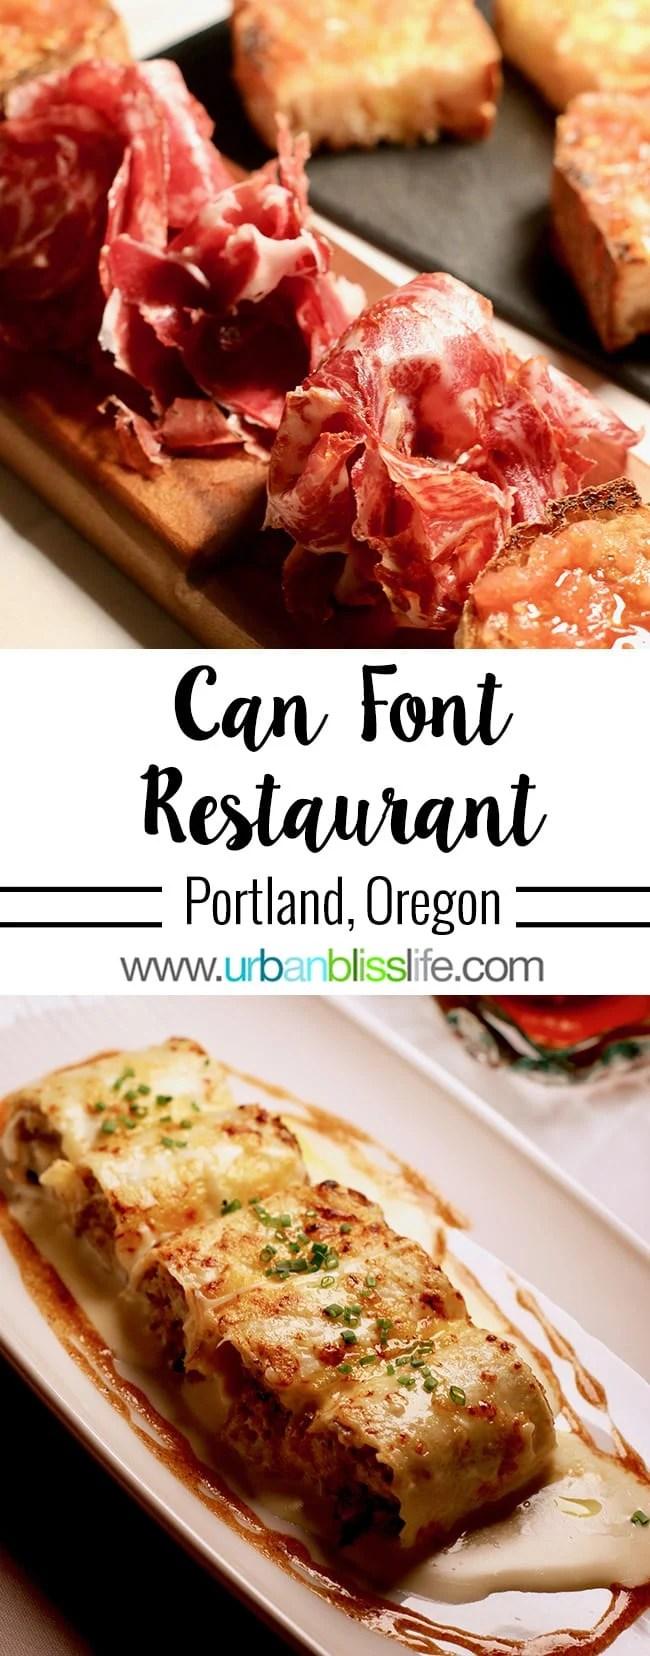 Can Font Portland: Catalan Cuisine in Portland, Oregon.